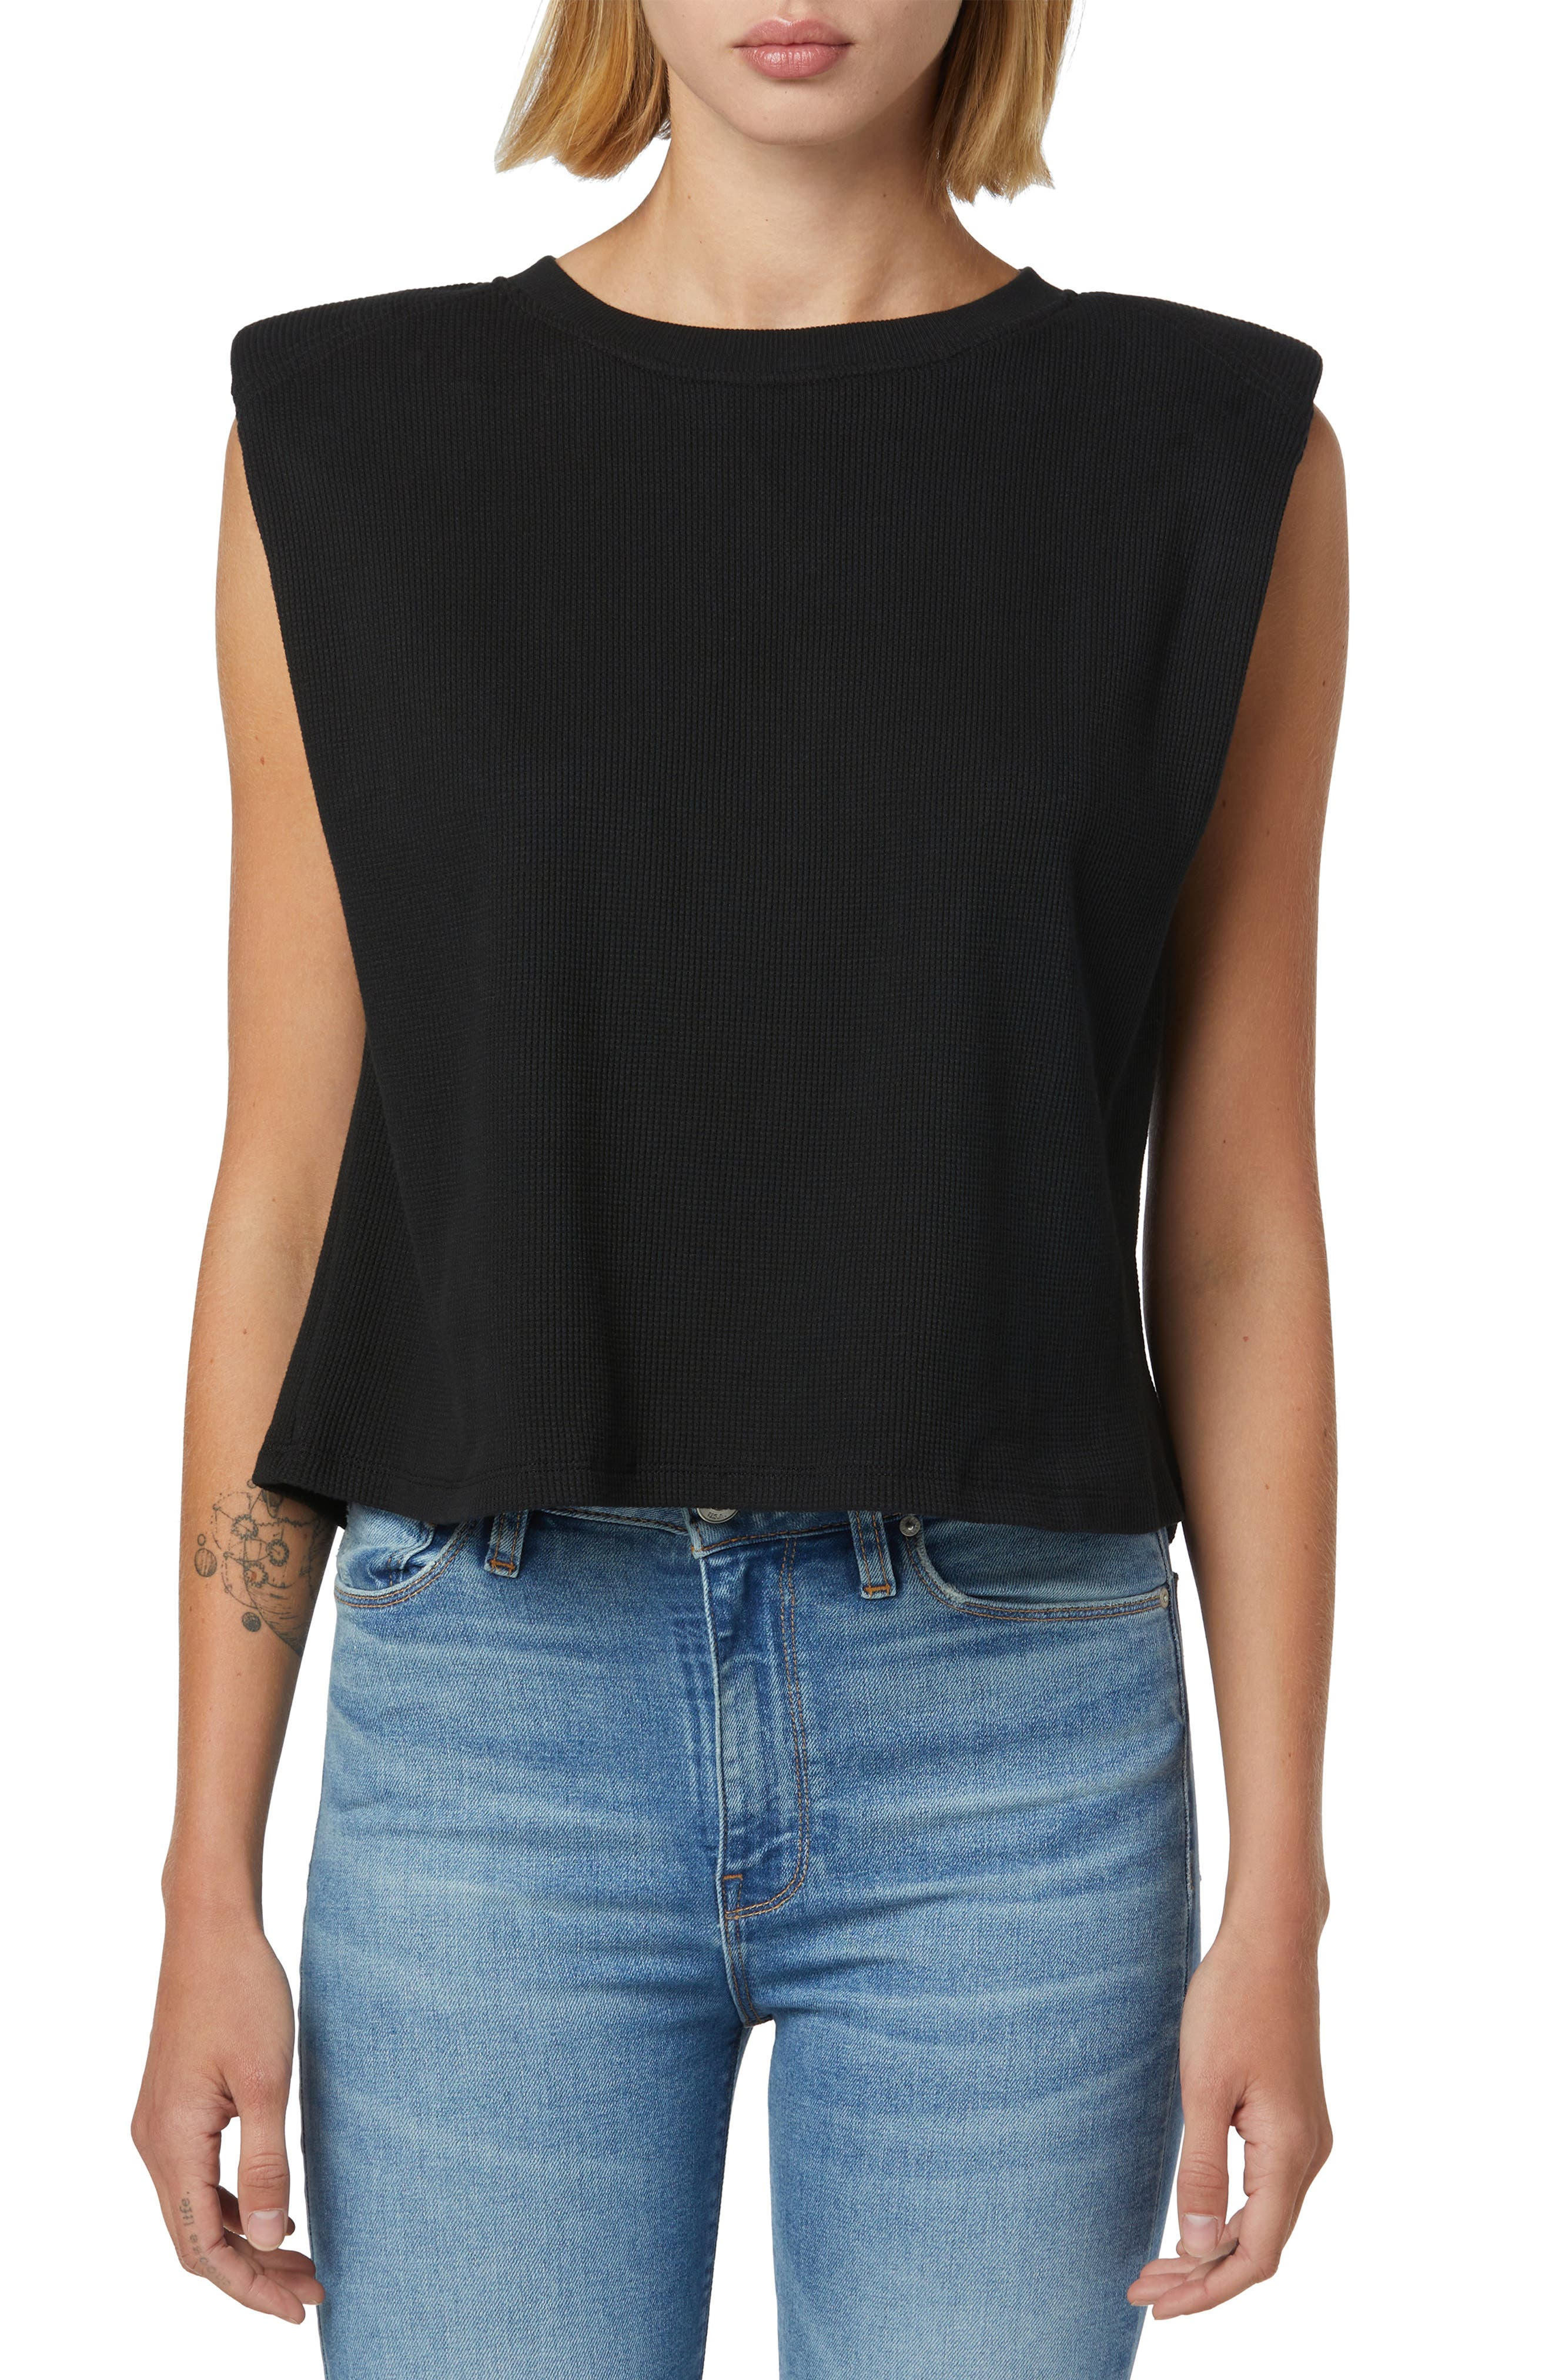 Shoulder Pad Sleeveless T-Shirt